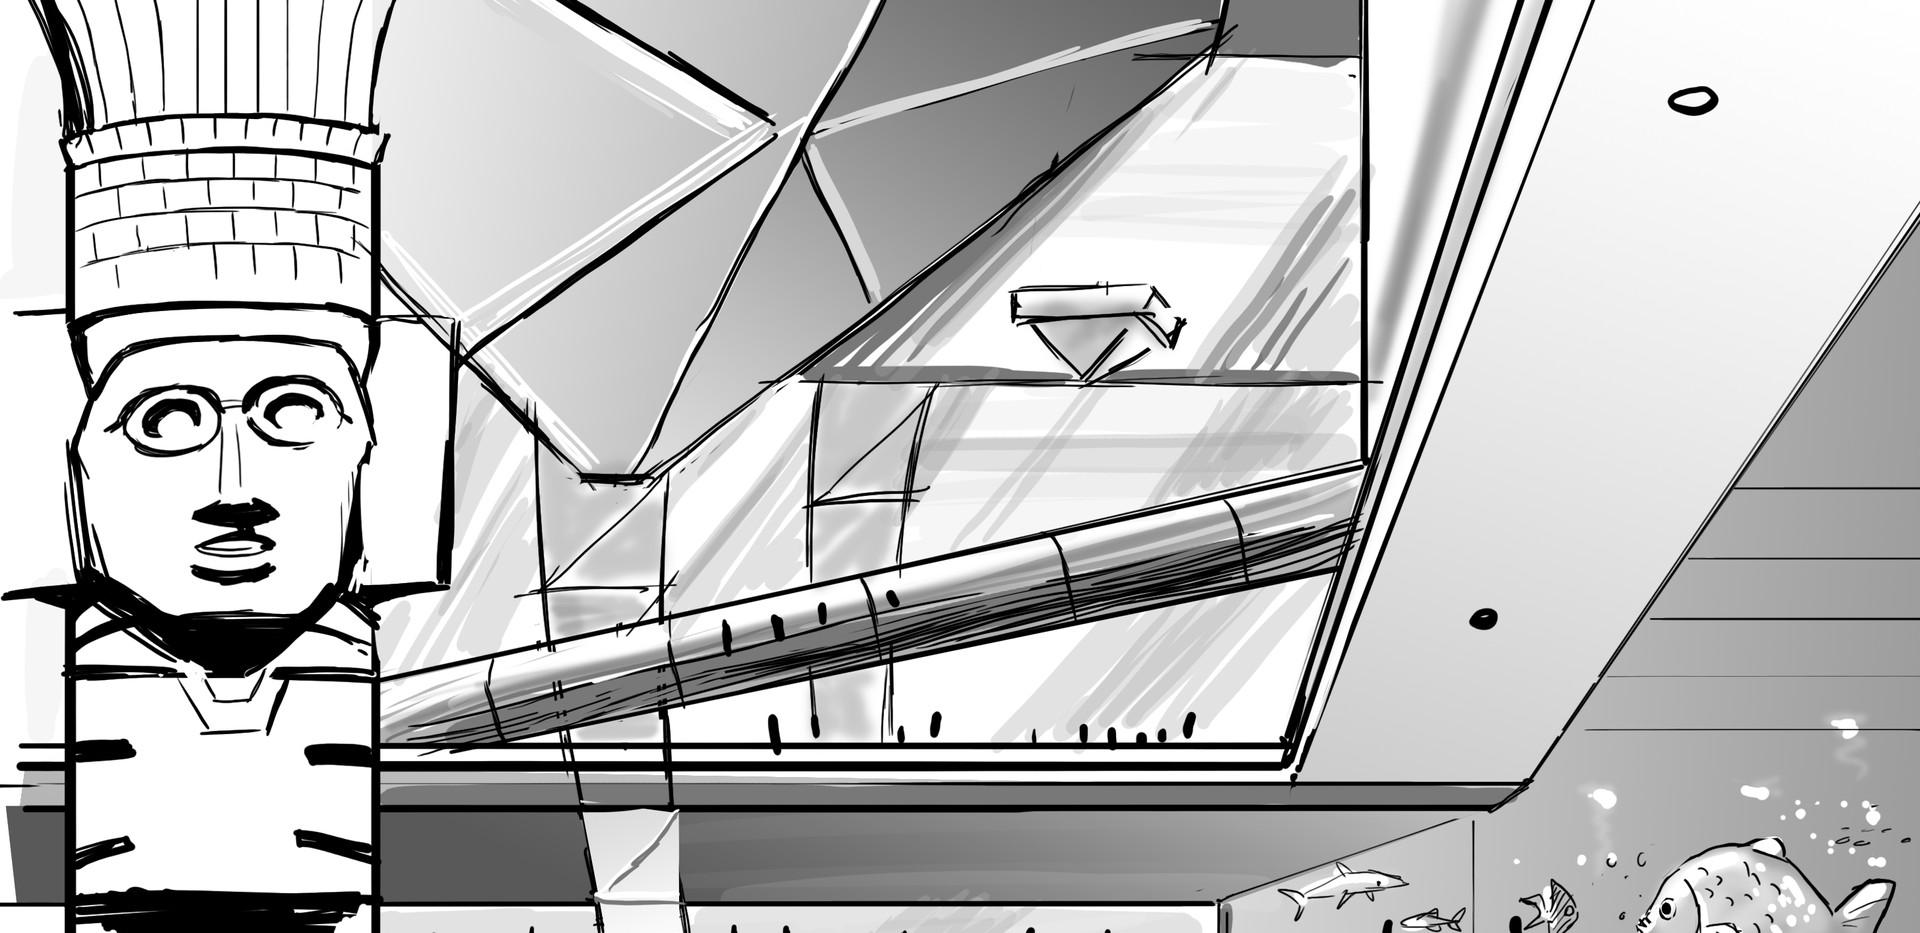 Airport concept art